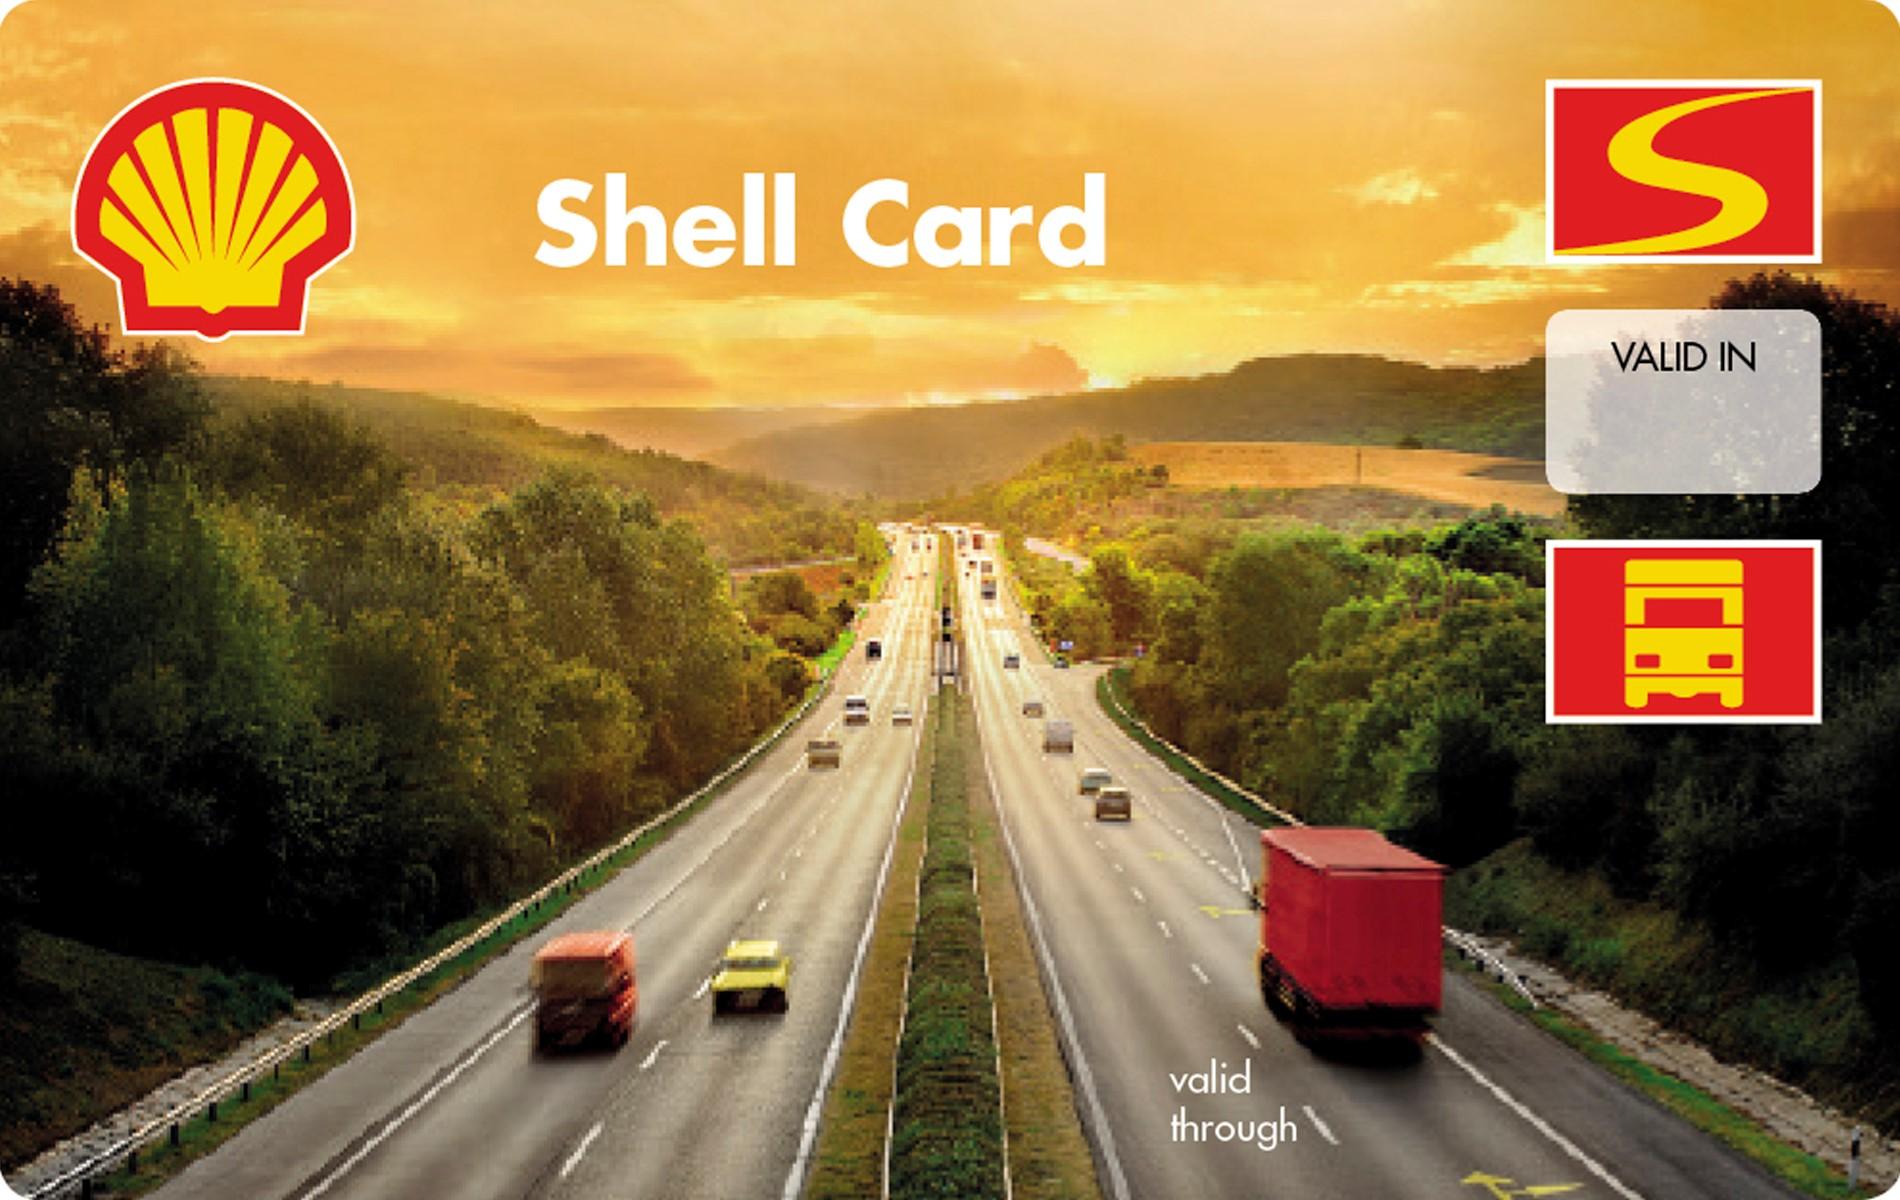 Shell Card dieselkortti